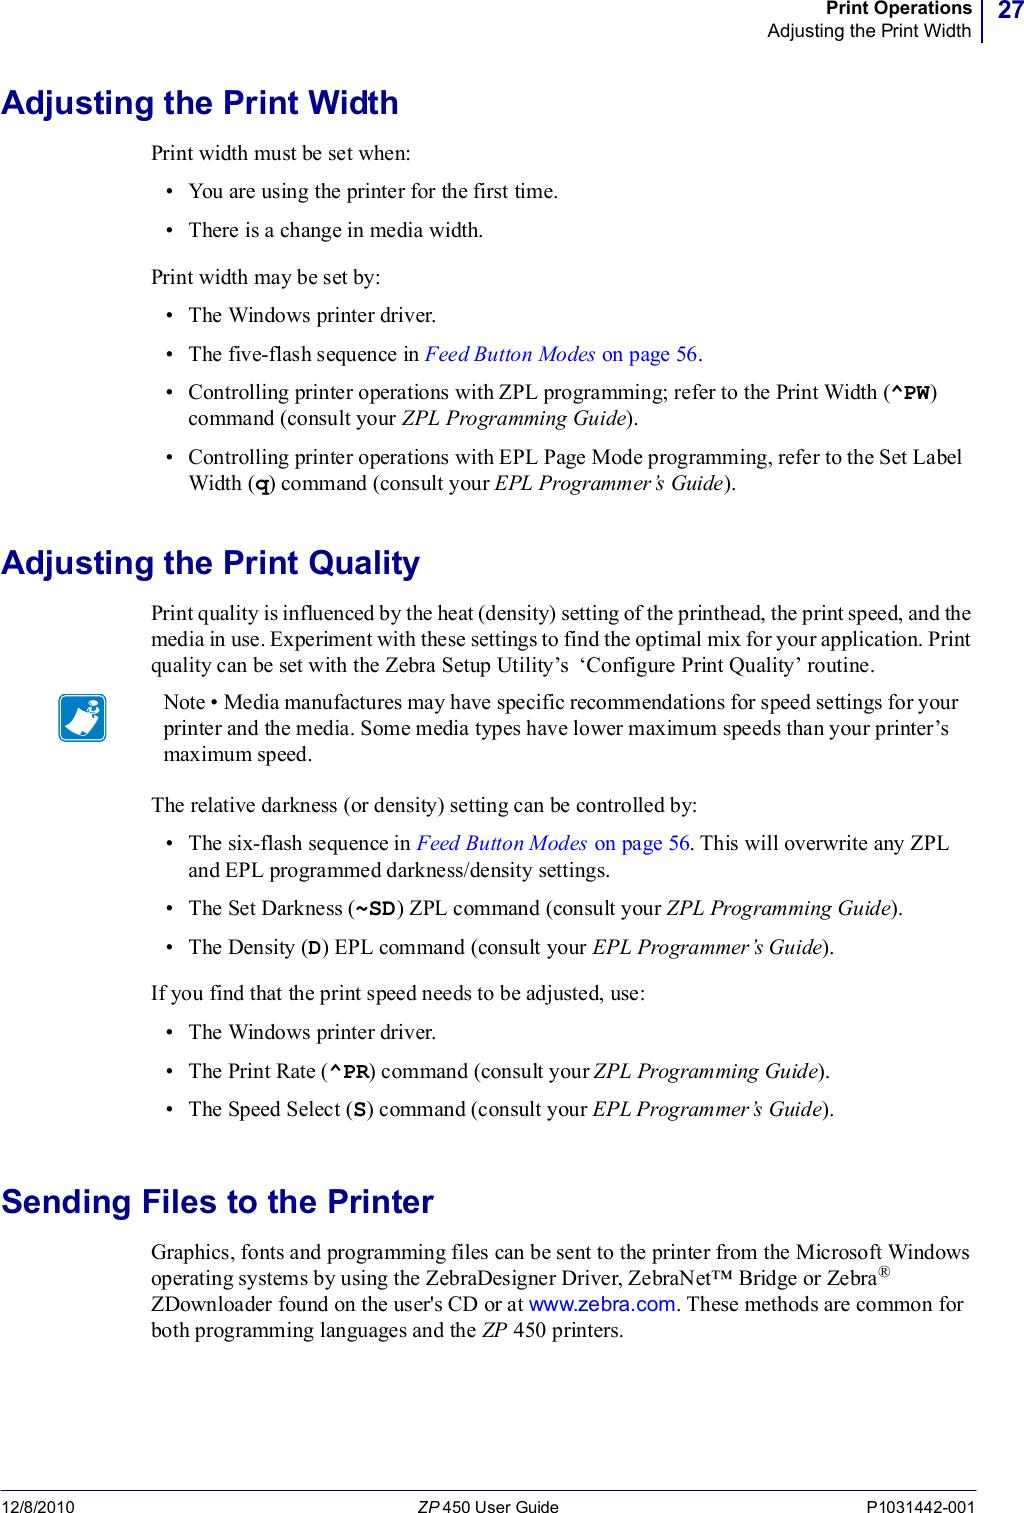 Zebra Browser Print Driver